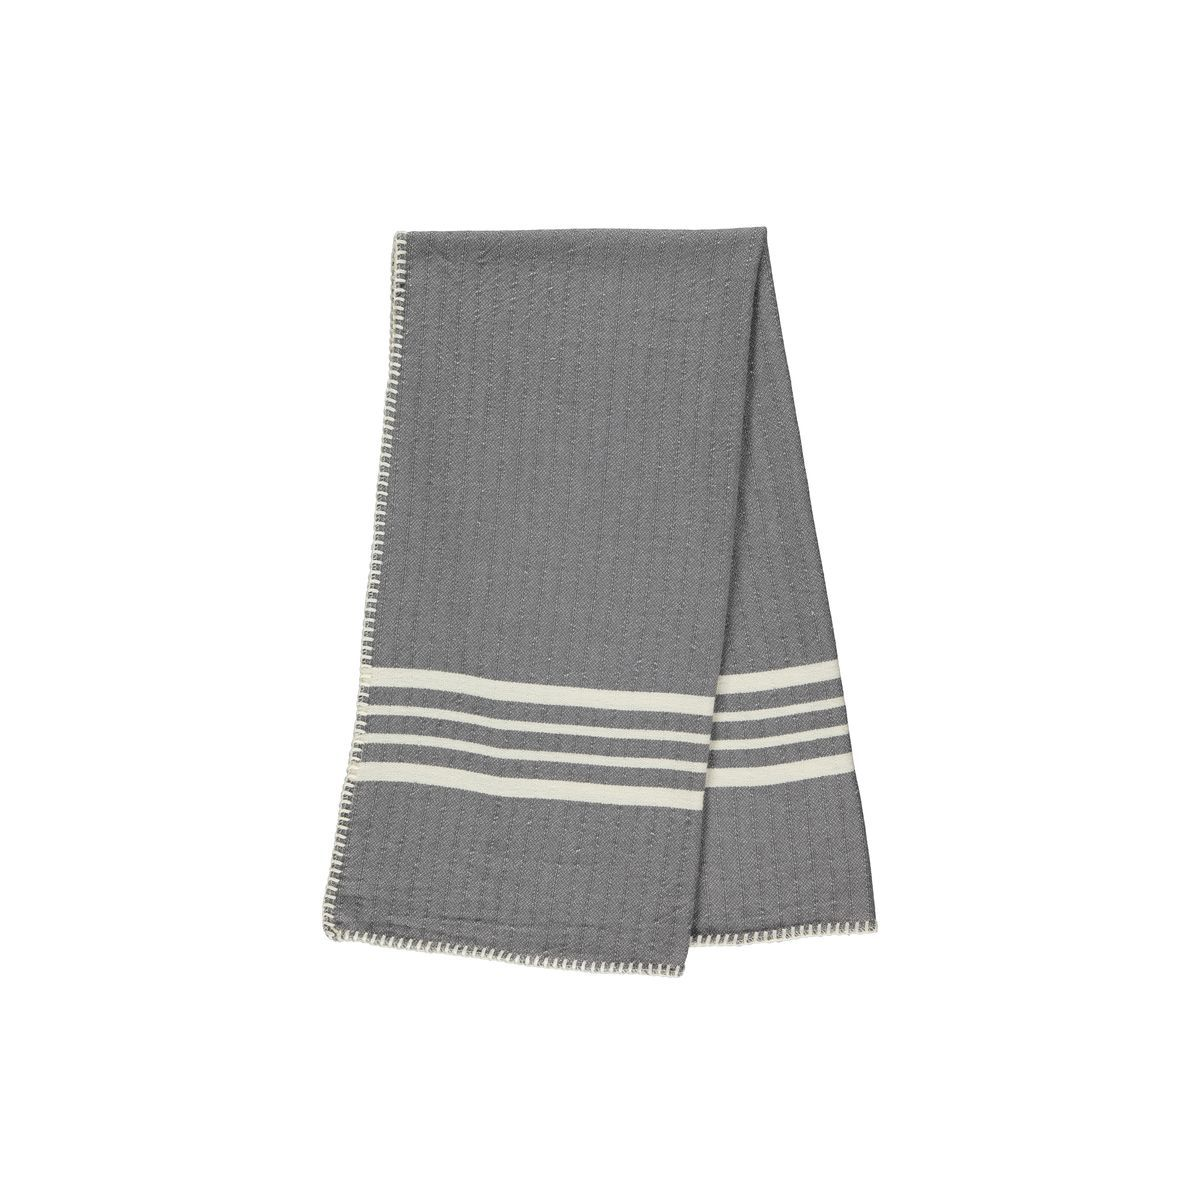 Peshkir Sultan - Stitched / Dark Grey